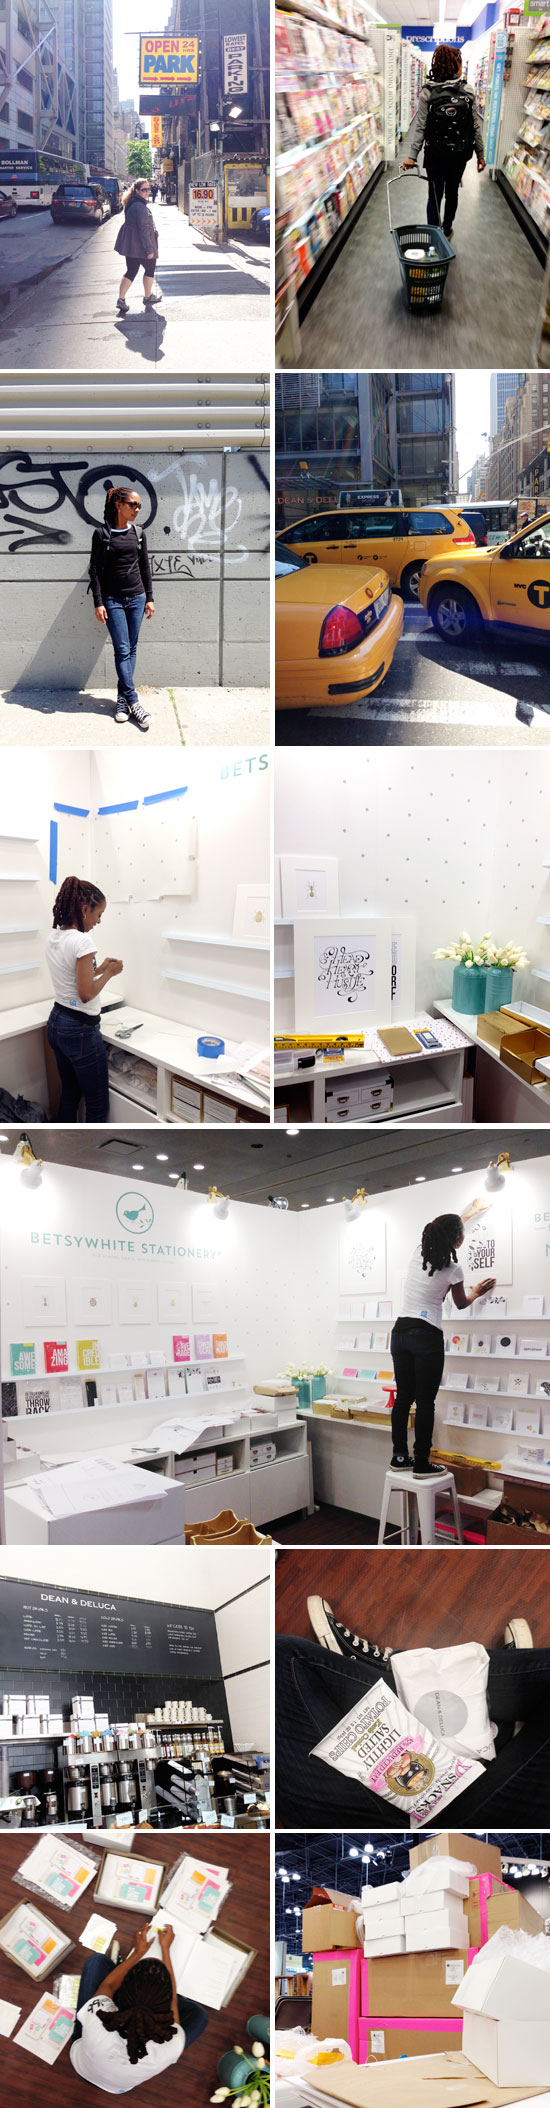 National Stationery Show 2014 - Setup Day 2